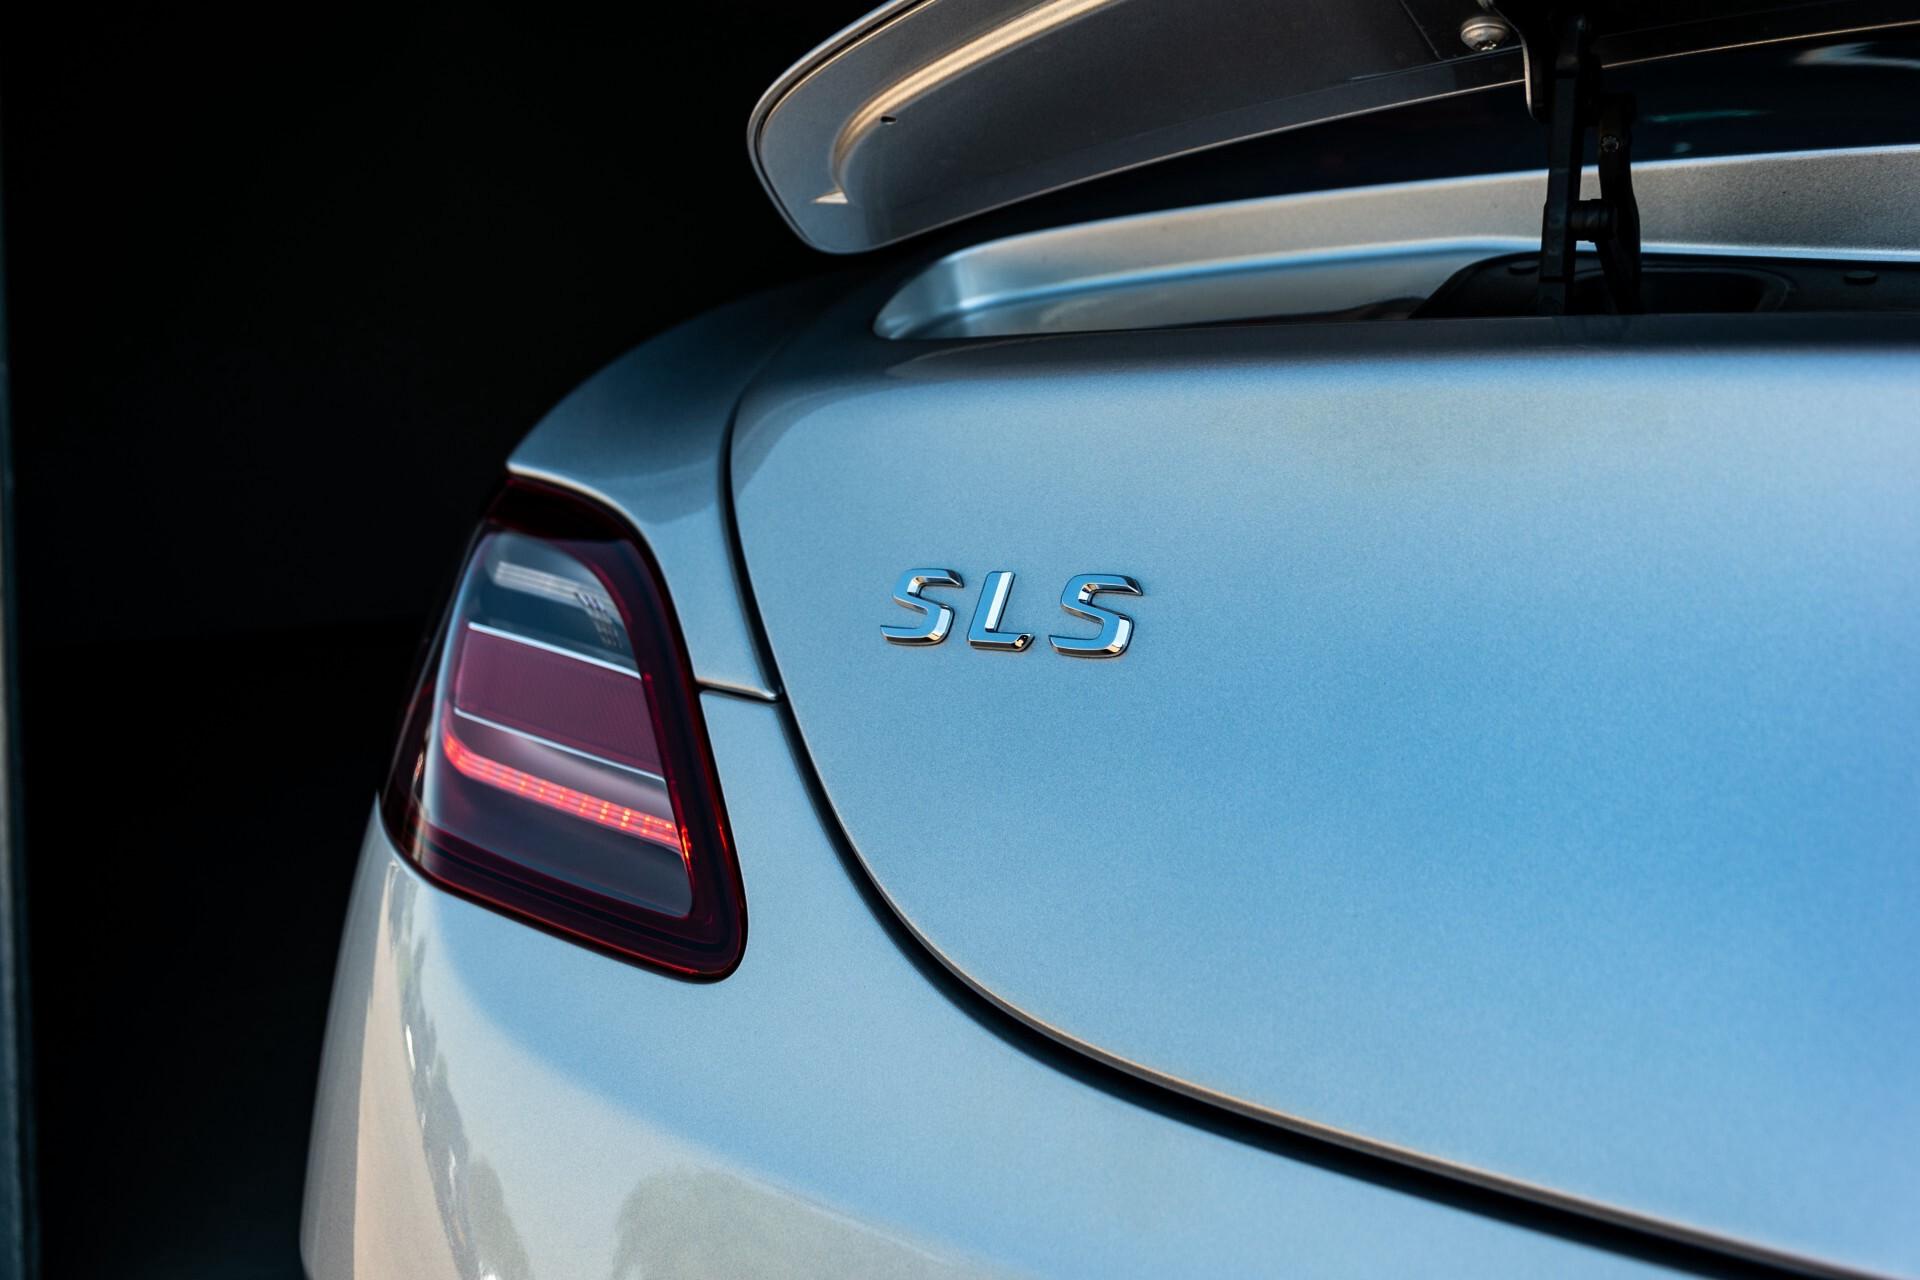 Mercedes-Benz SLS-Klasse Coupe 6.3 AMG 1ste eigenaar/NL Auto FULL OPTIONS Aut7 Foto 54